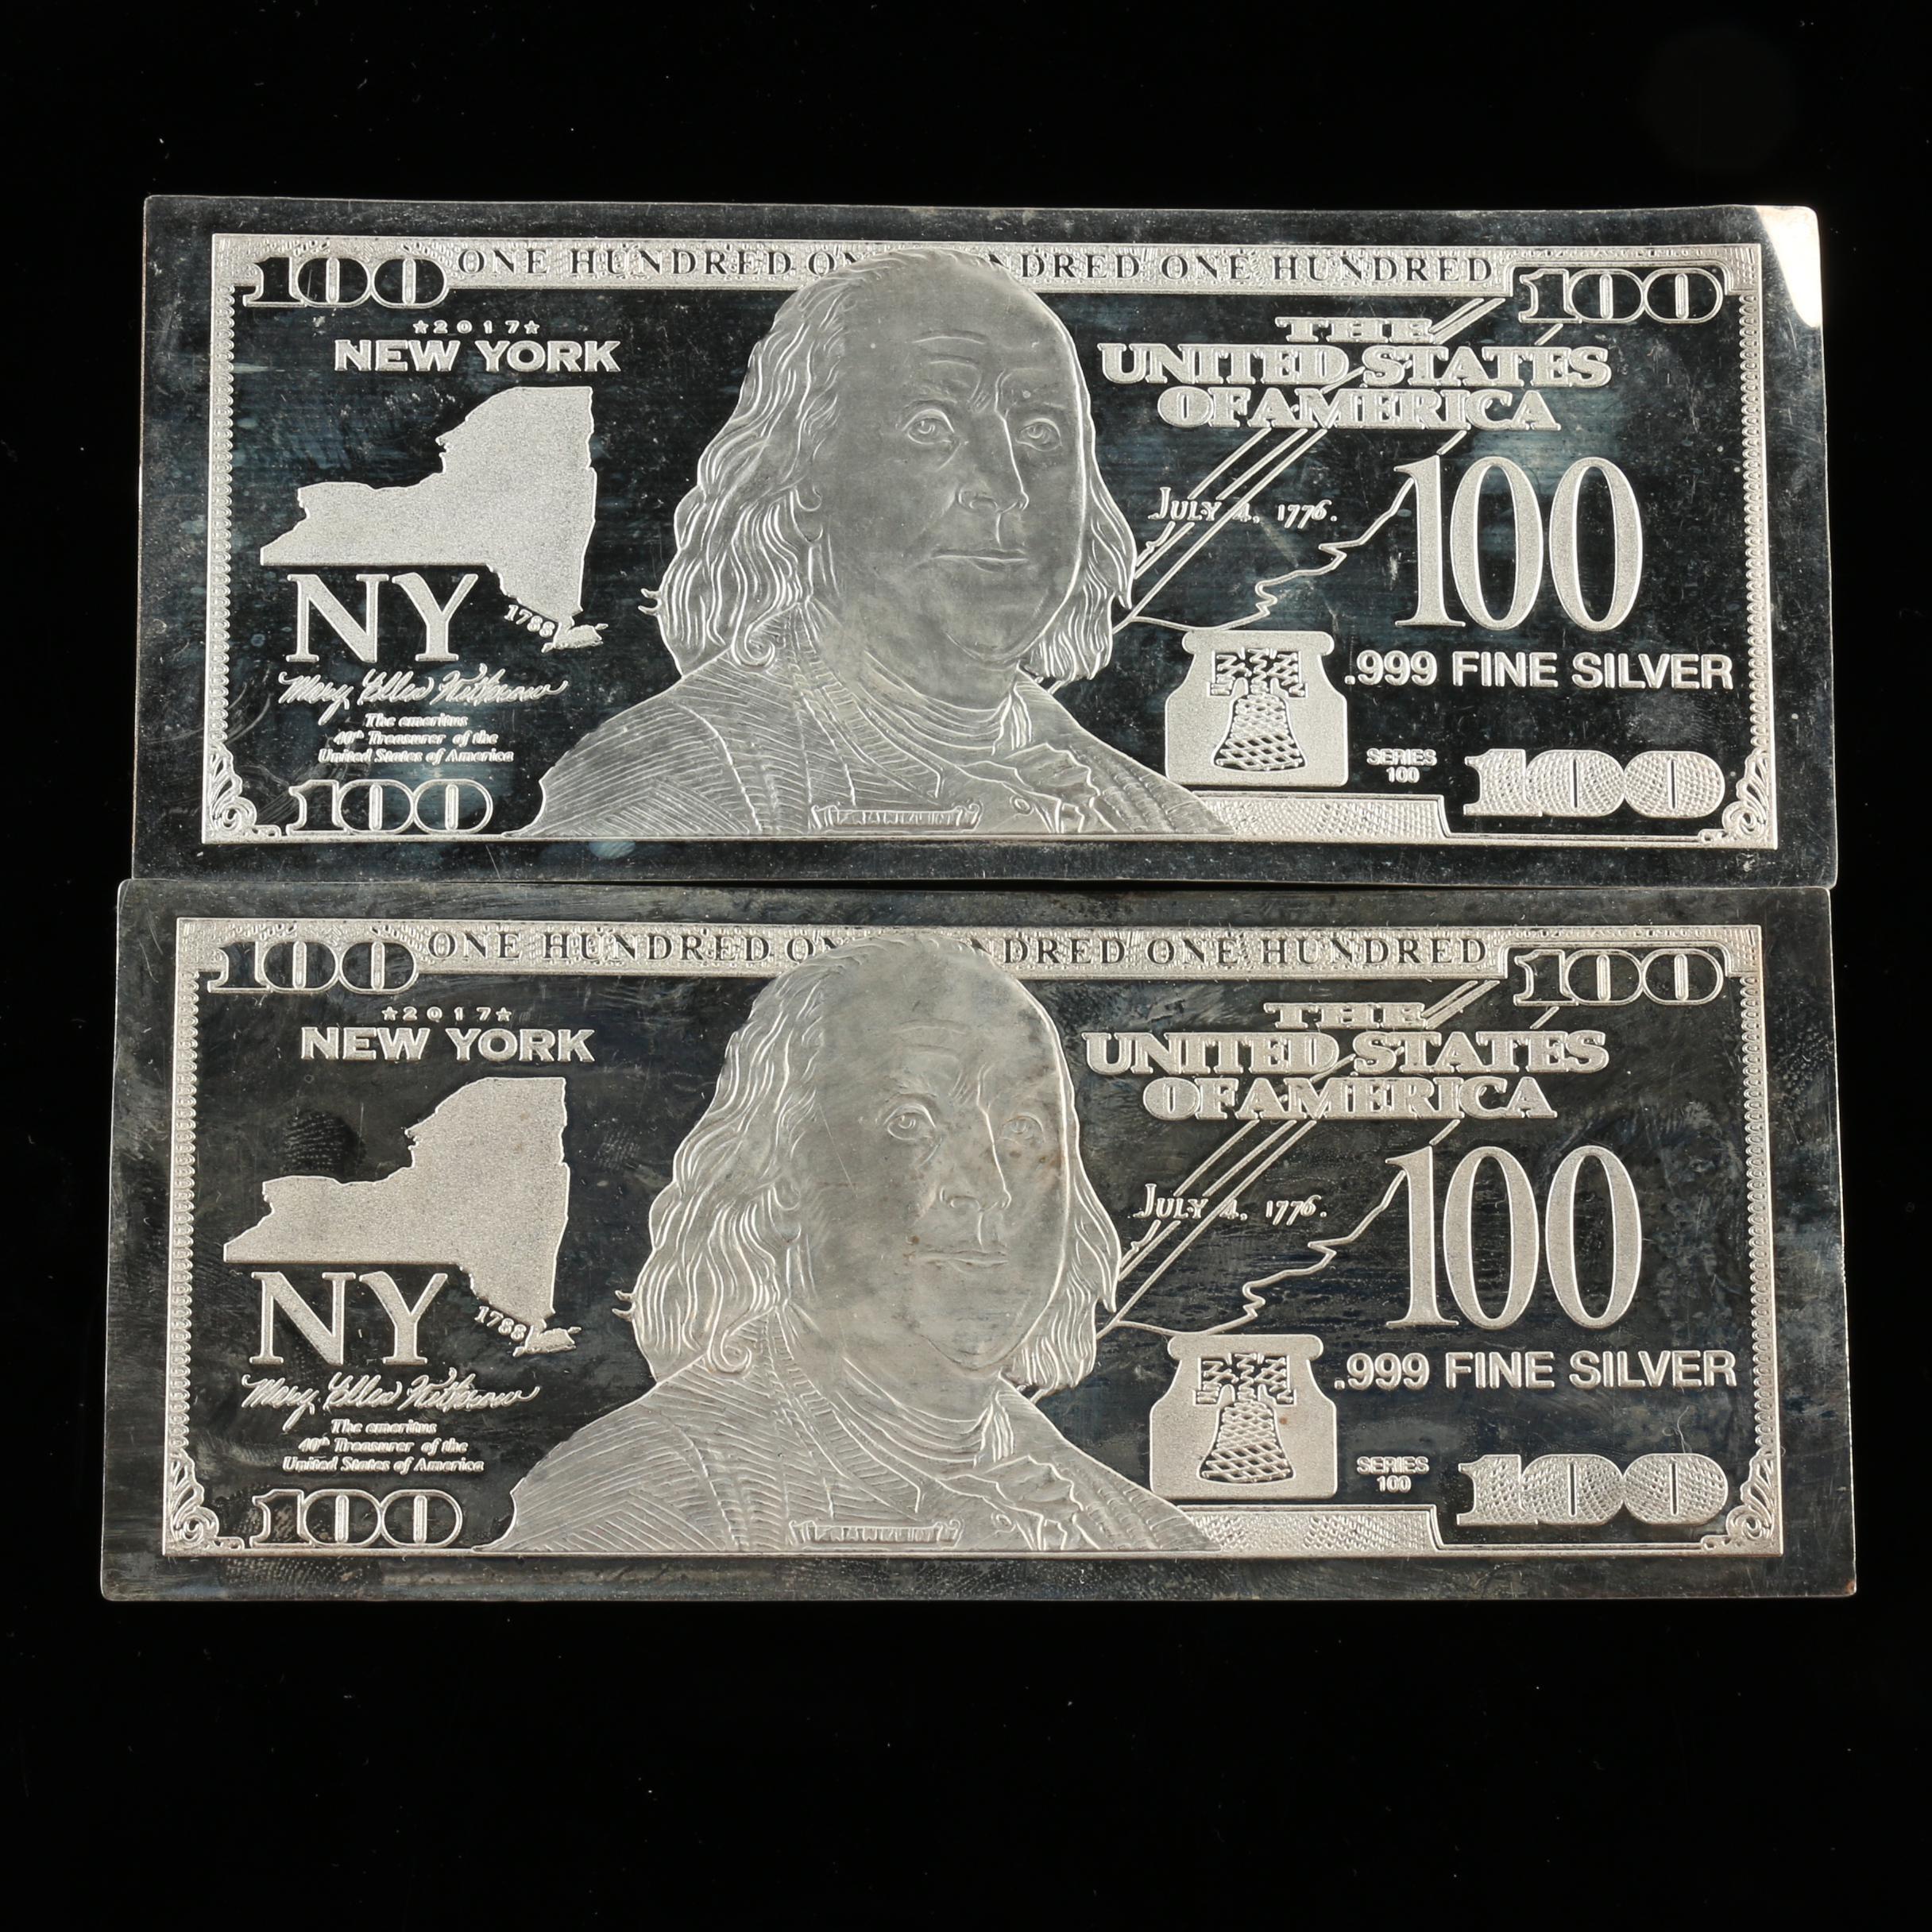 Two 1-Oz. Fine Silver $100 Federal Reserve Note Replicas